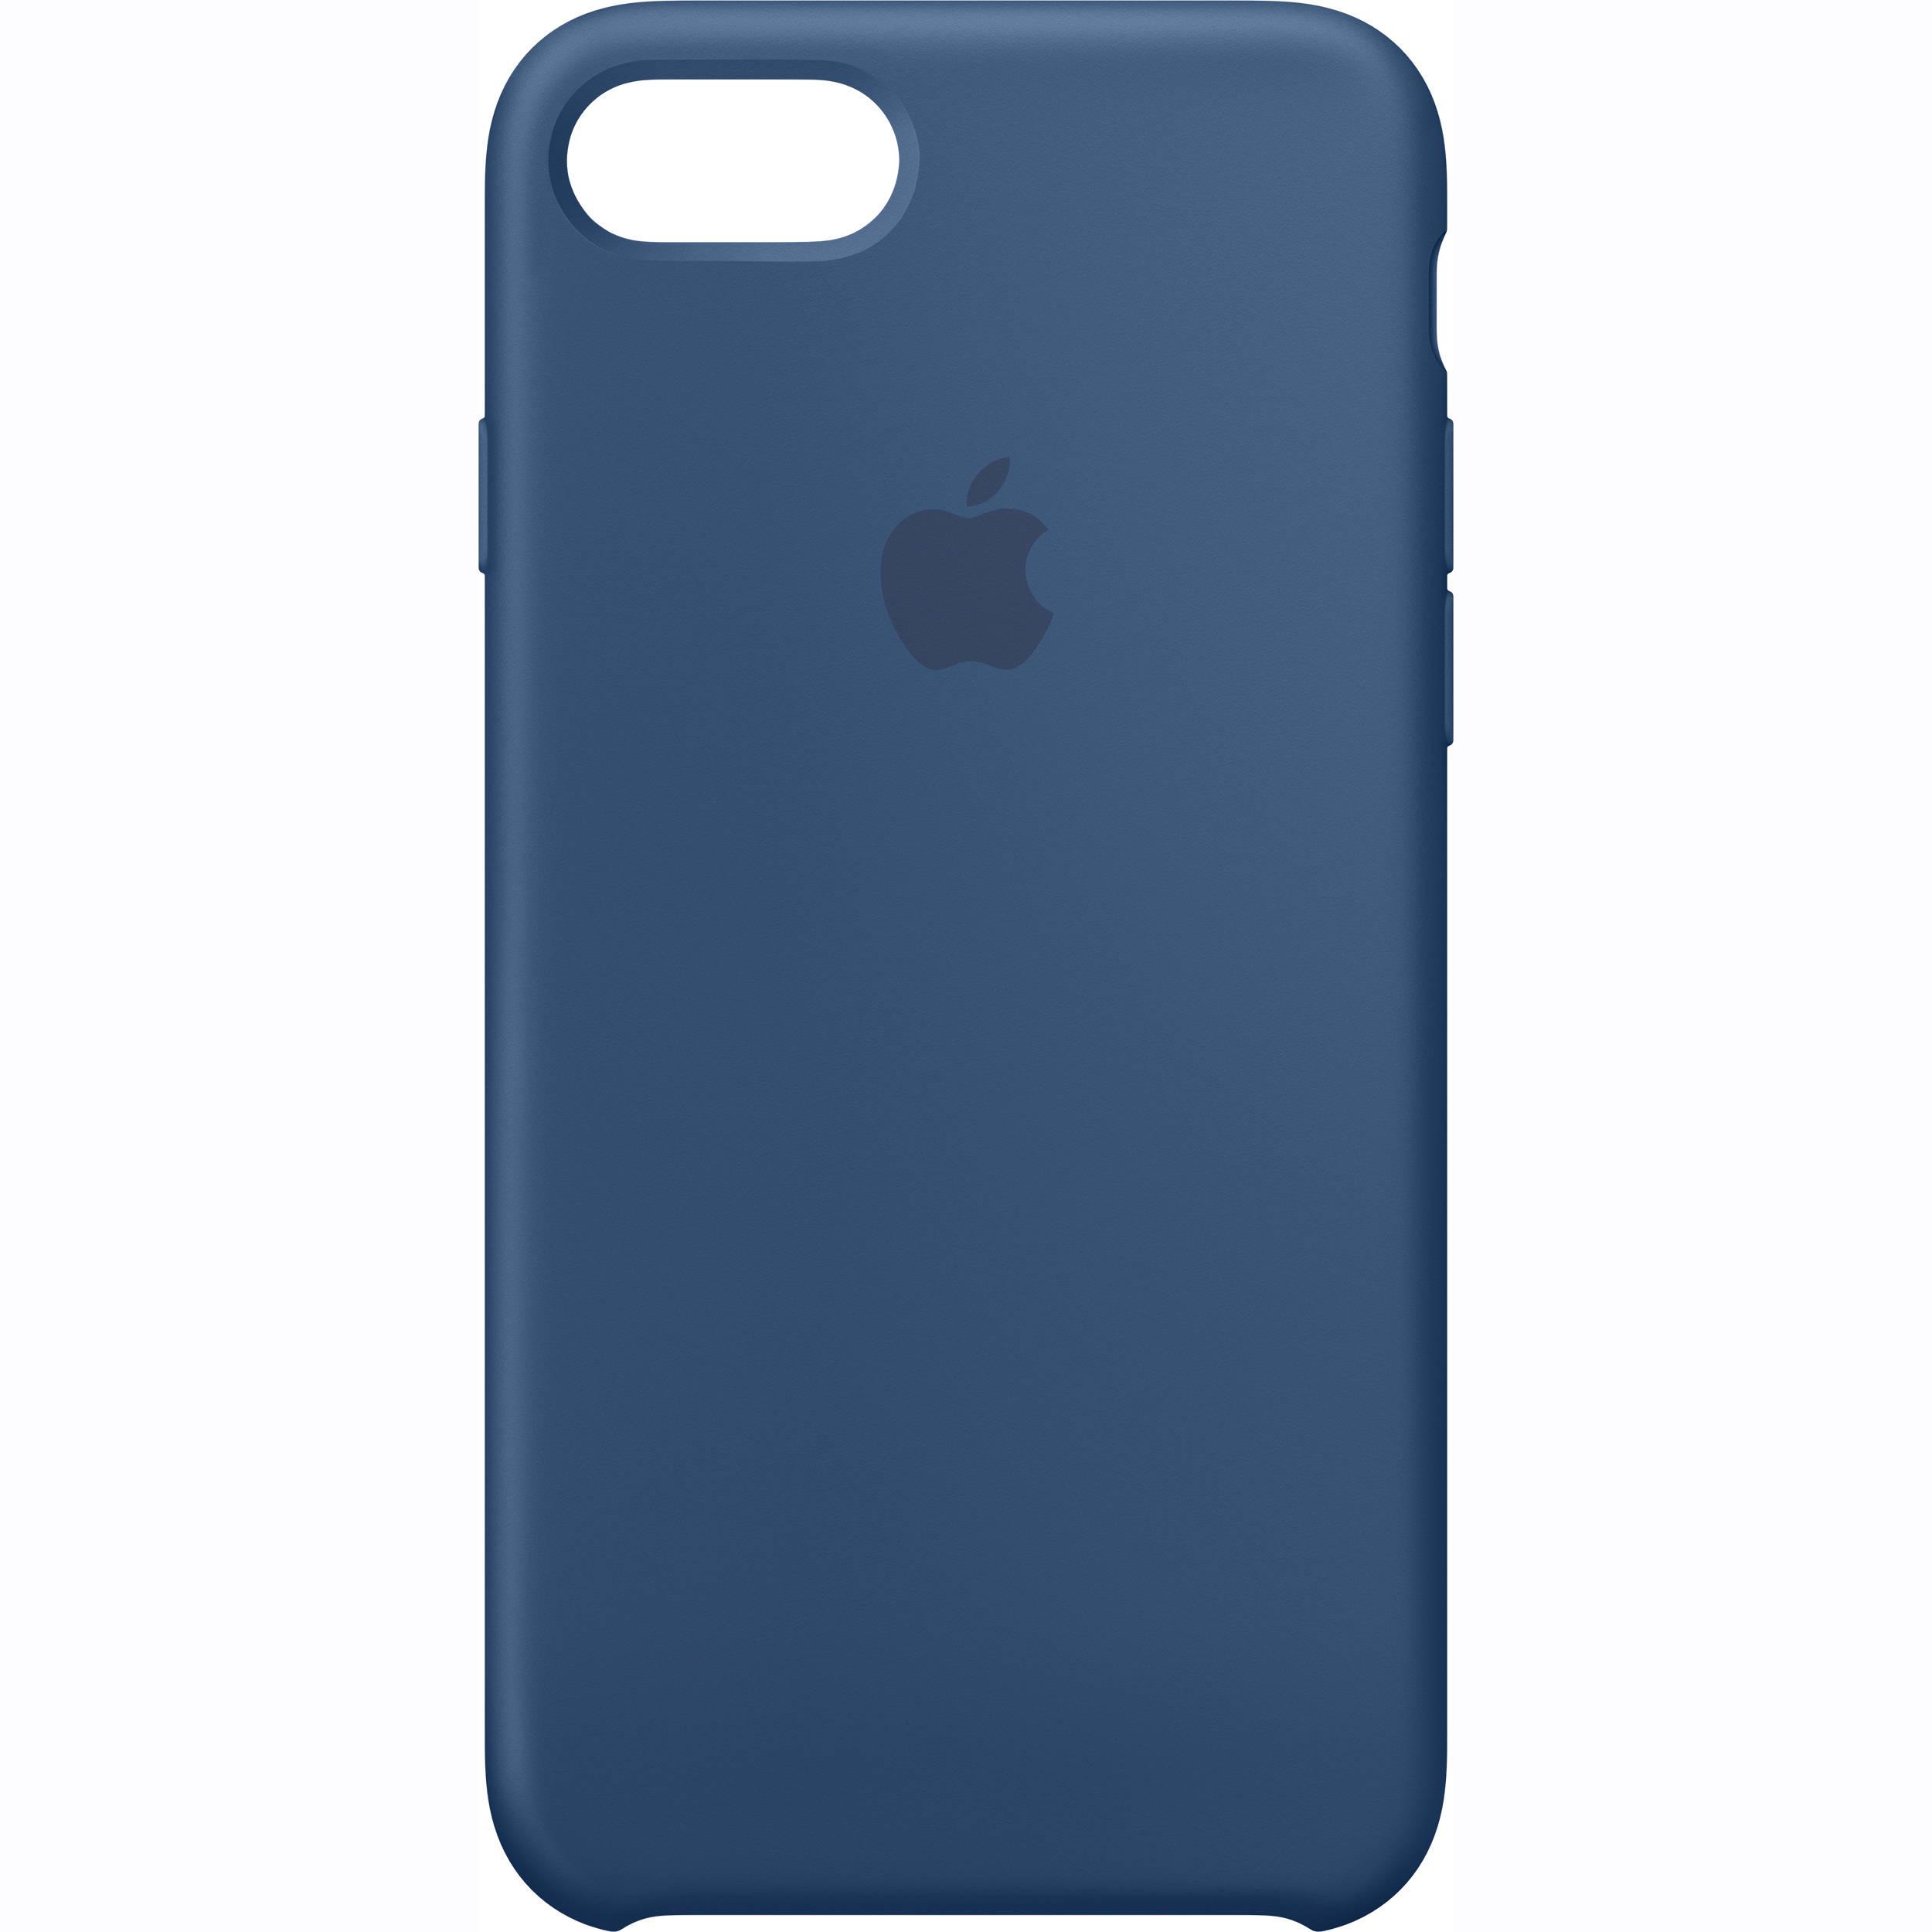 blue apple iphone 7 case